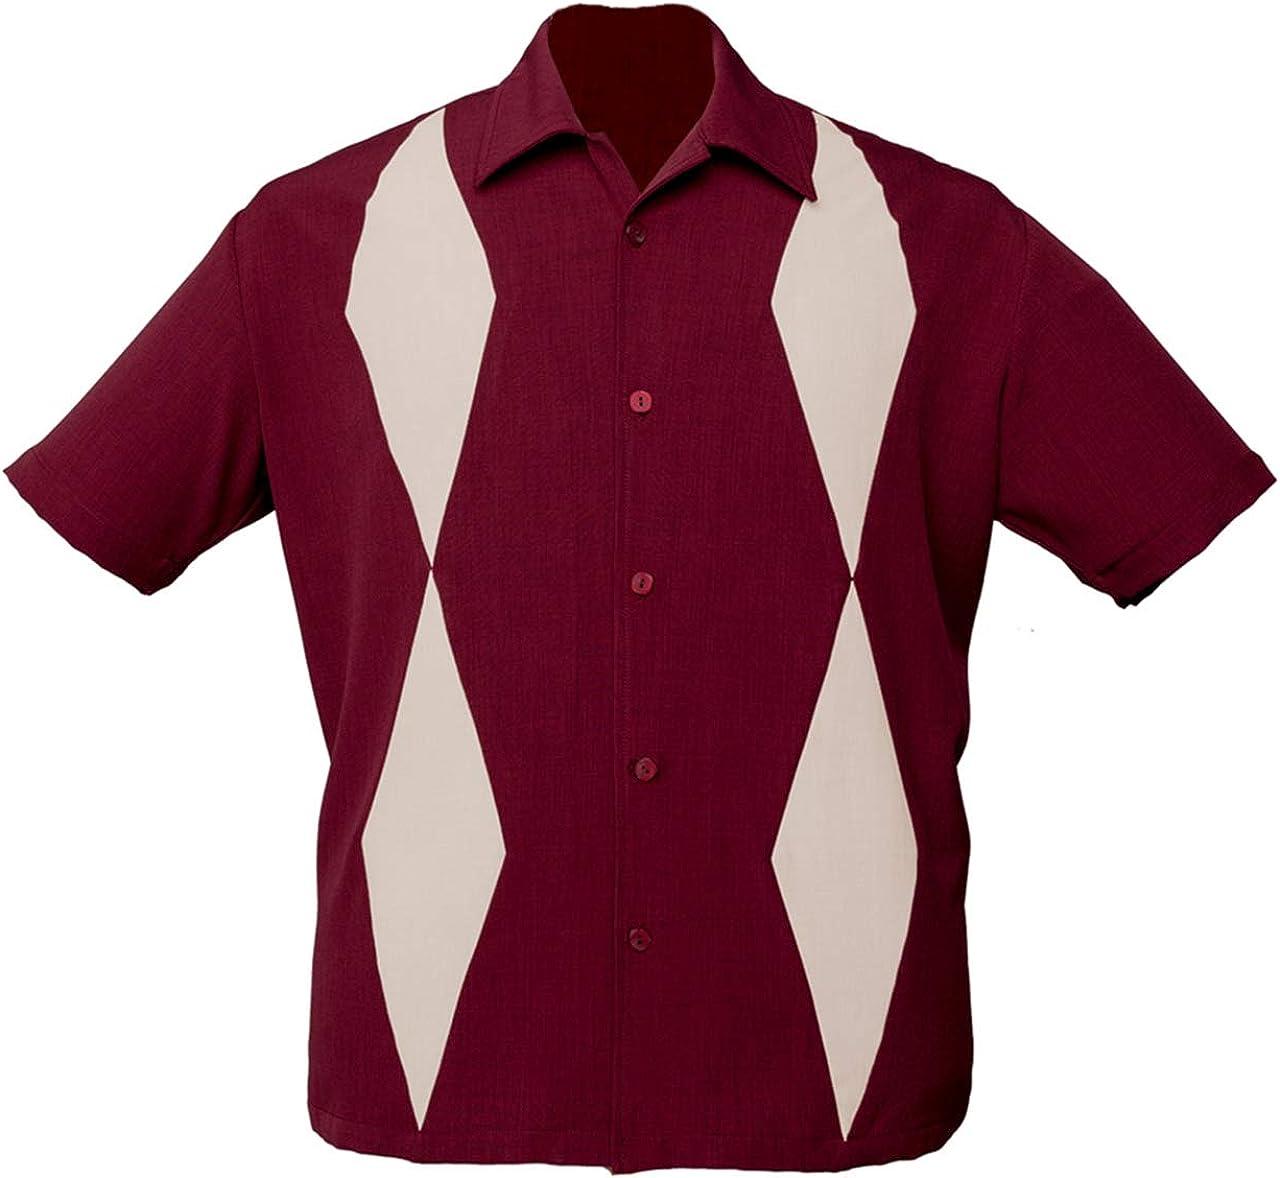 STEADY CLOTHING Diamond Duo - Camisa de Bolos, Color Granate